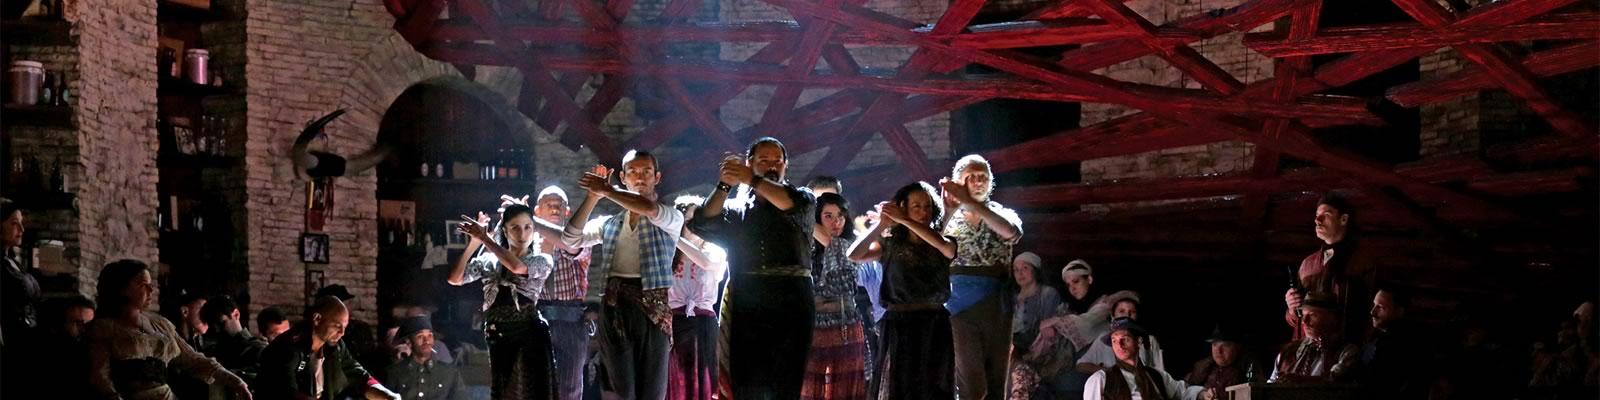 A scene from the Metropolitan Opera's production of Carmen. Photo courtesy Metropolitan Opera.